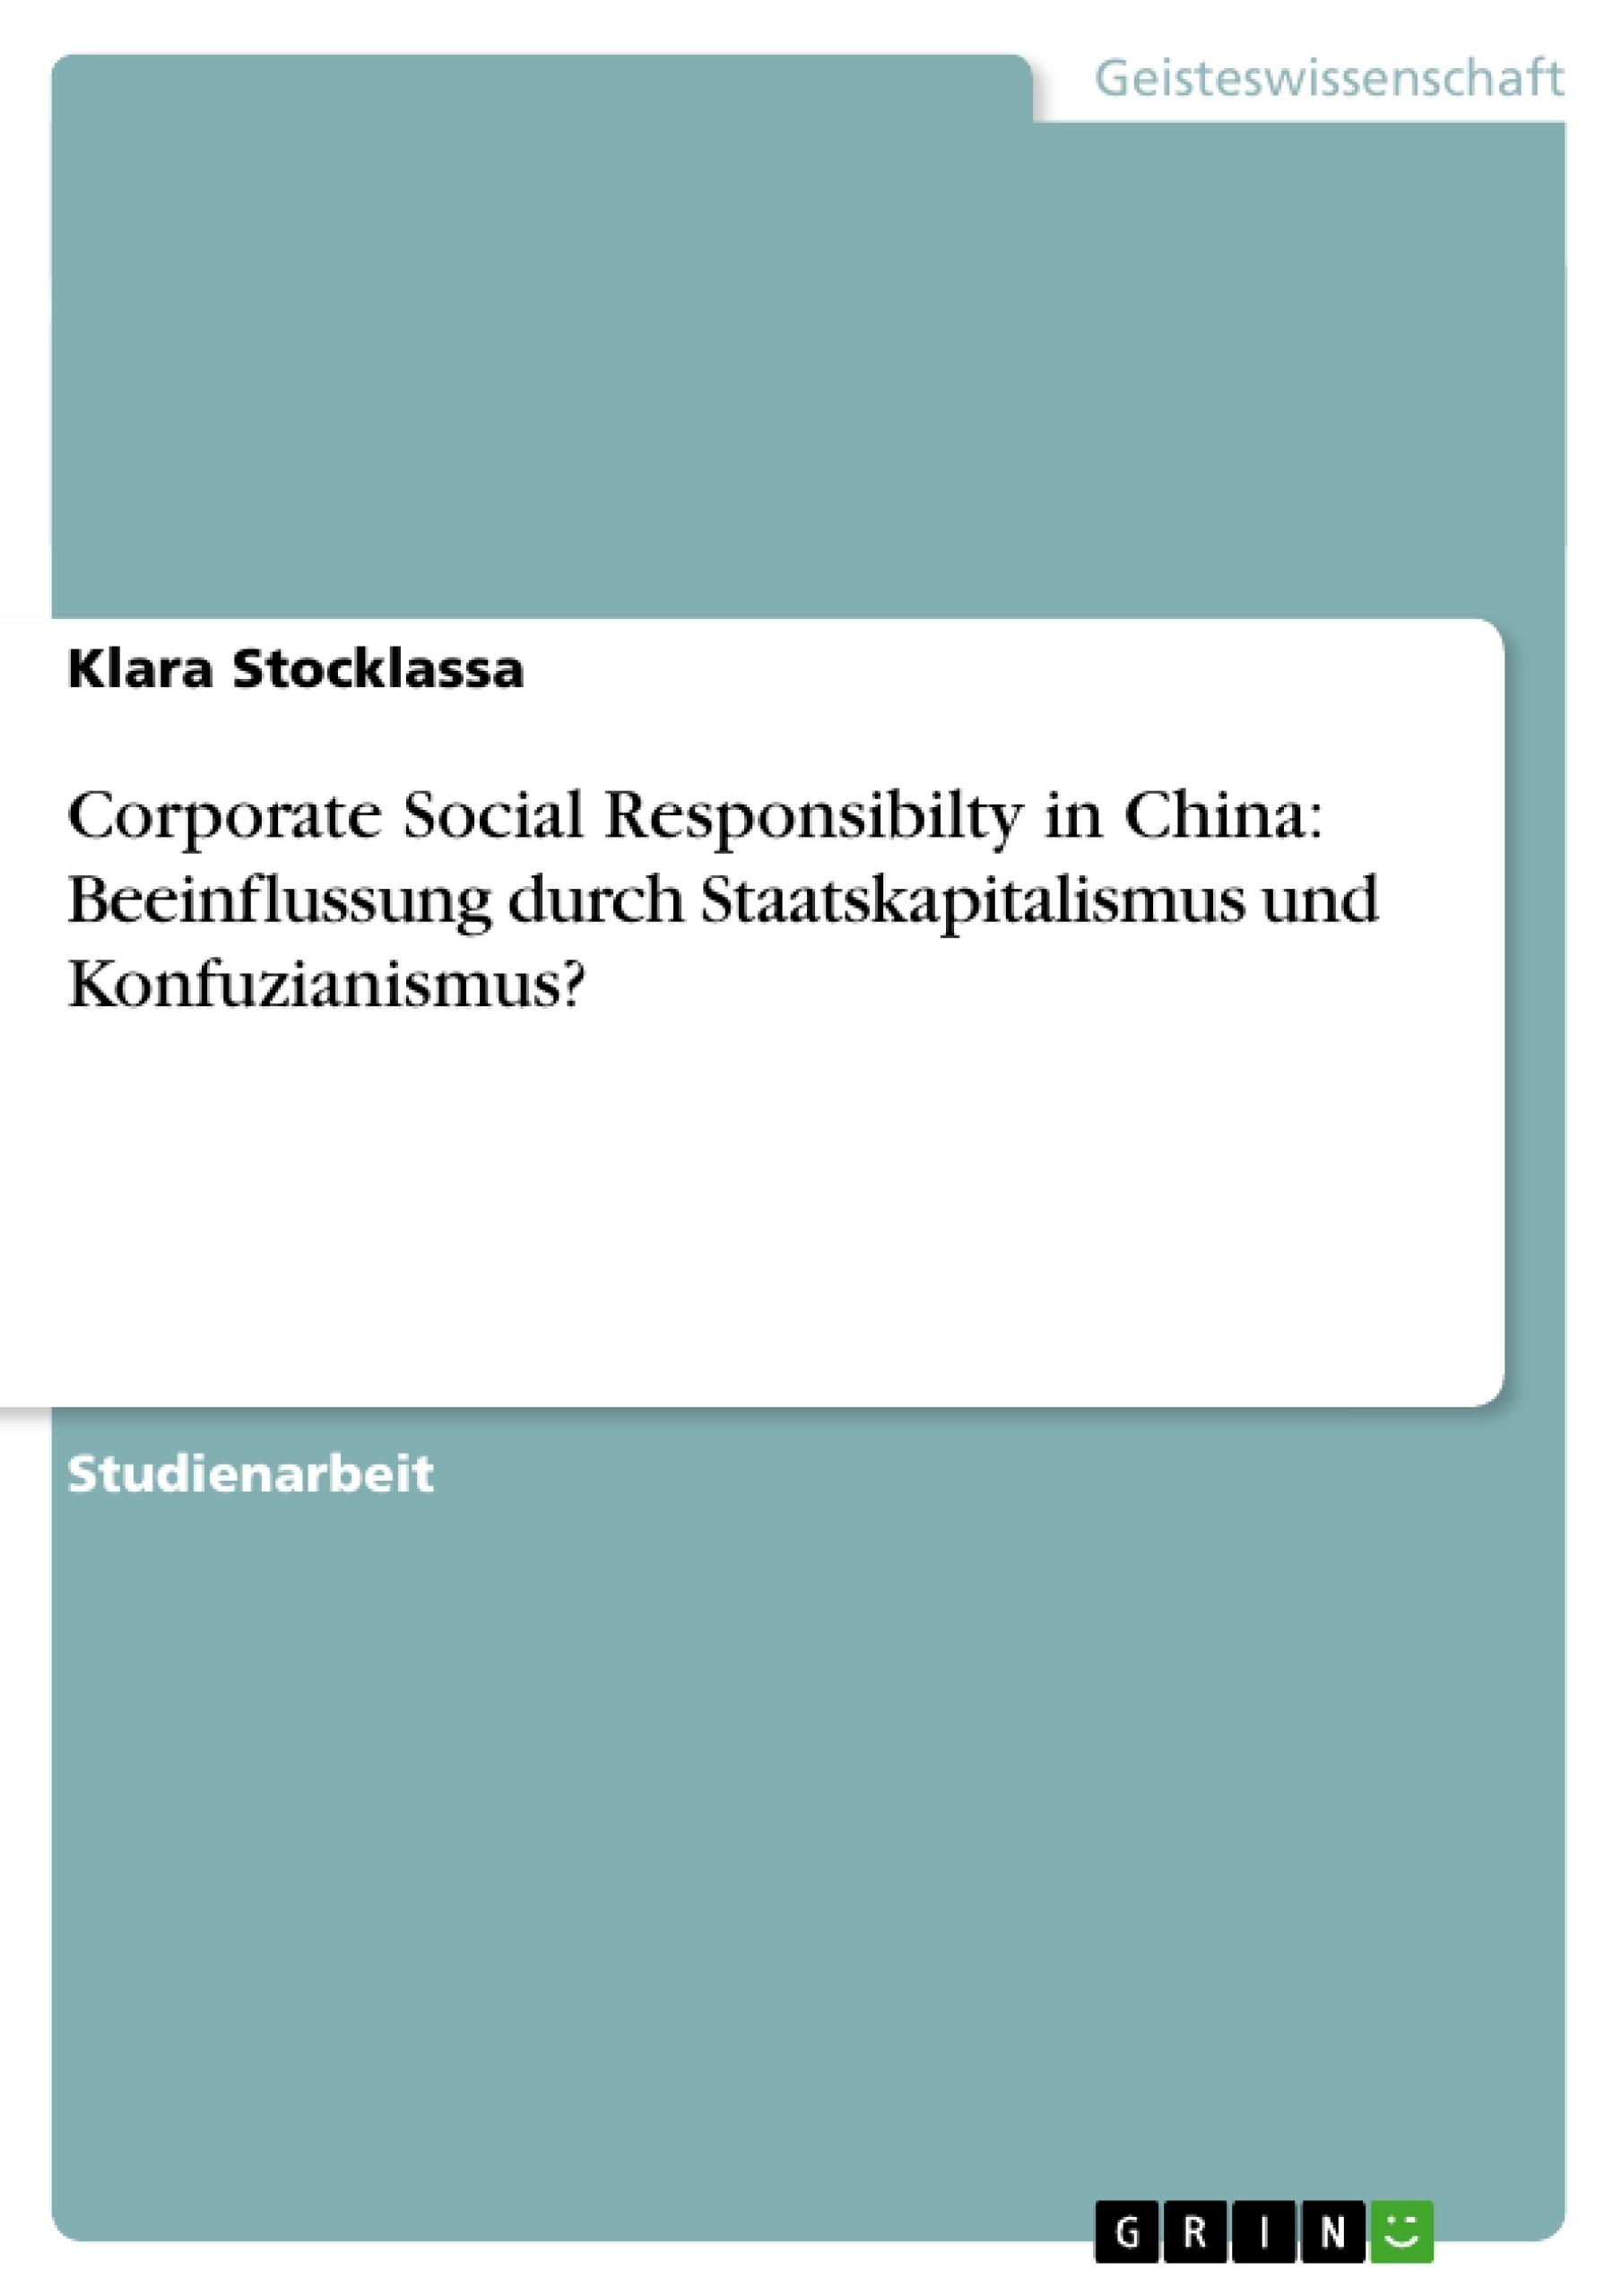 Titel: Corporate Social Responsibilty in China: Beeinflussung durch Staatskapitalismus und Konfuzianismus?